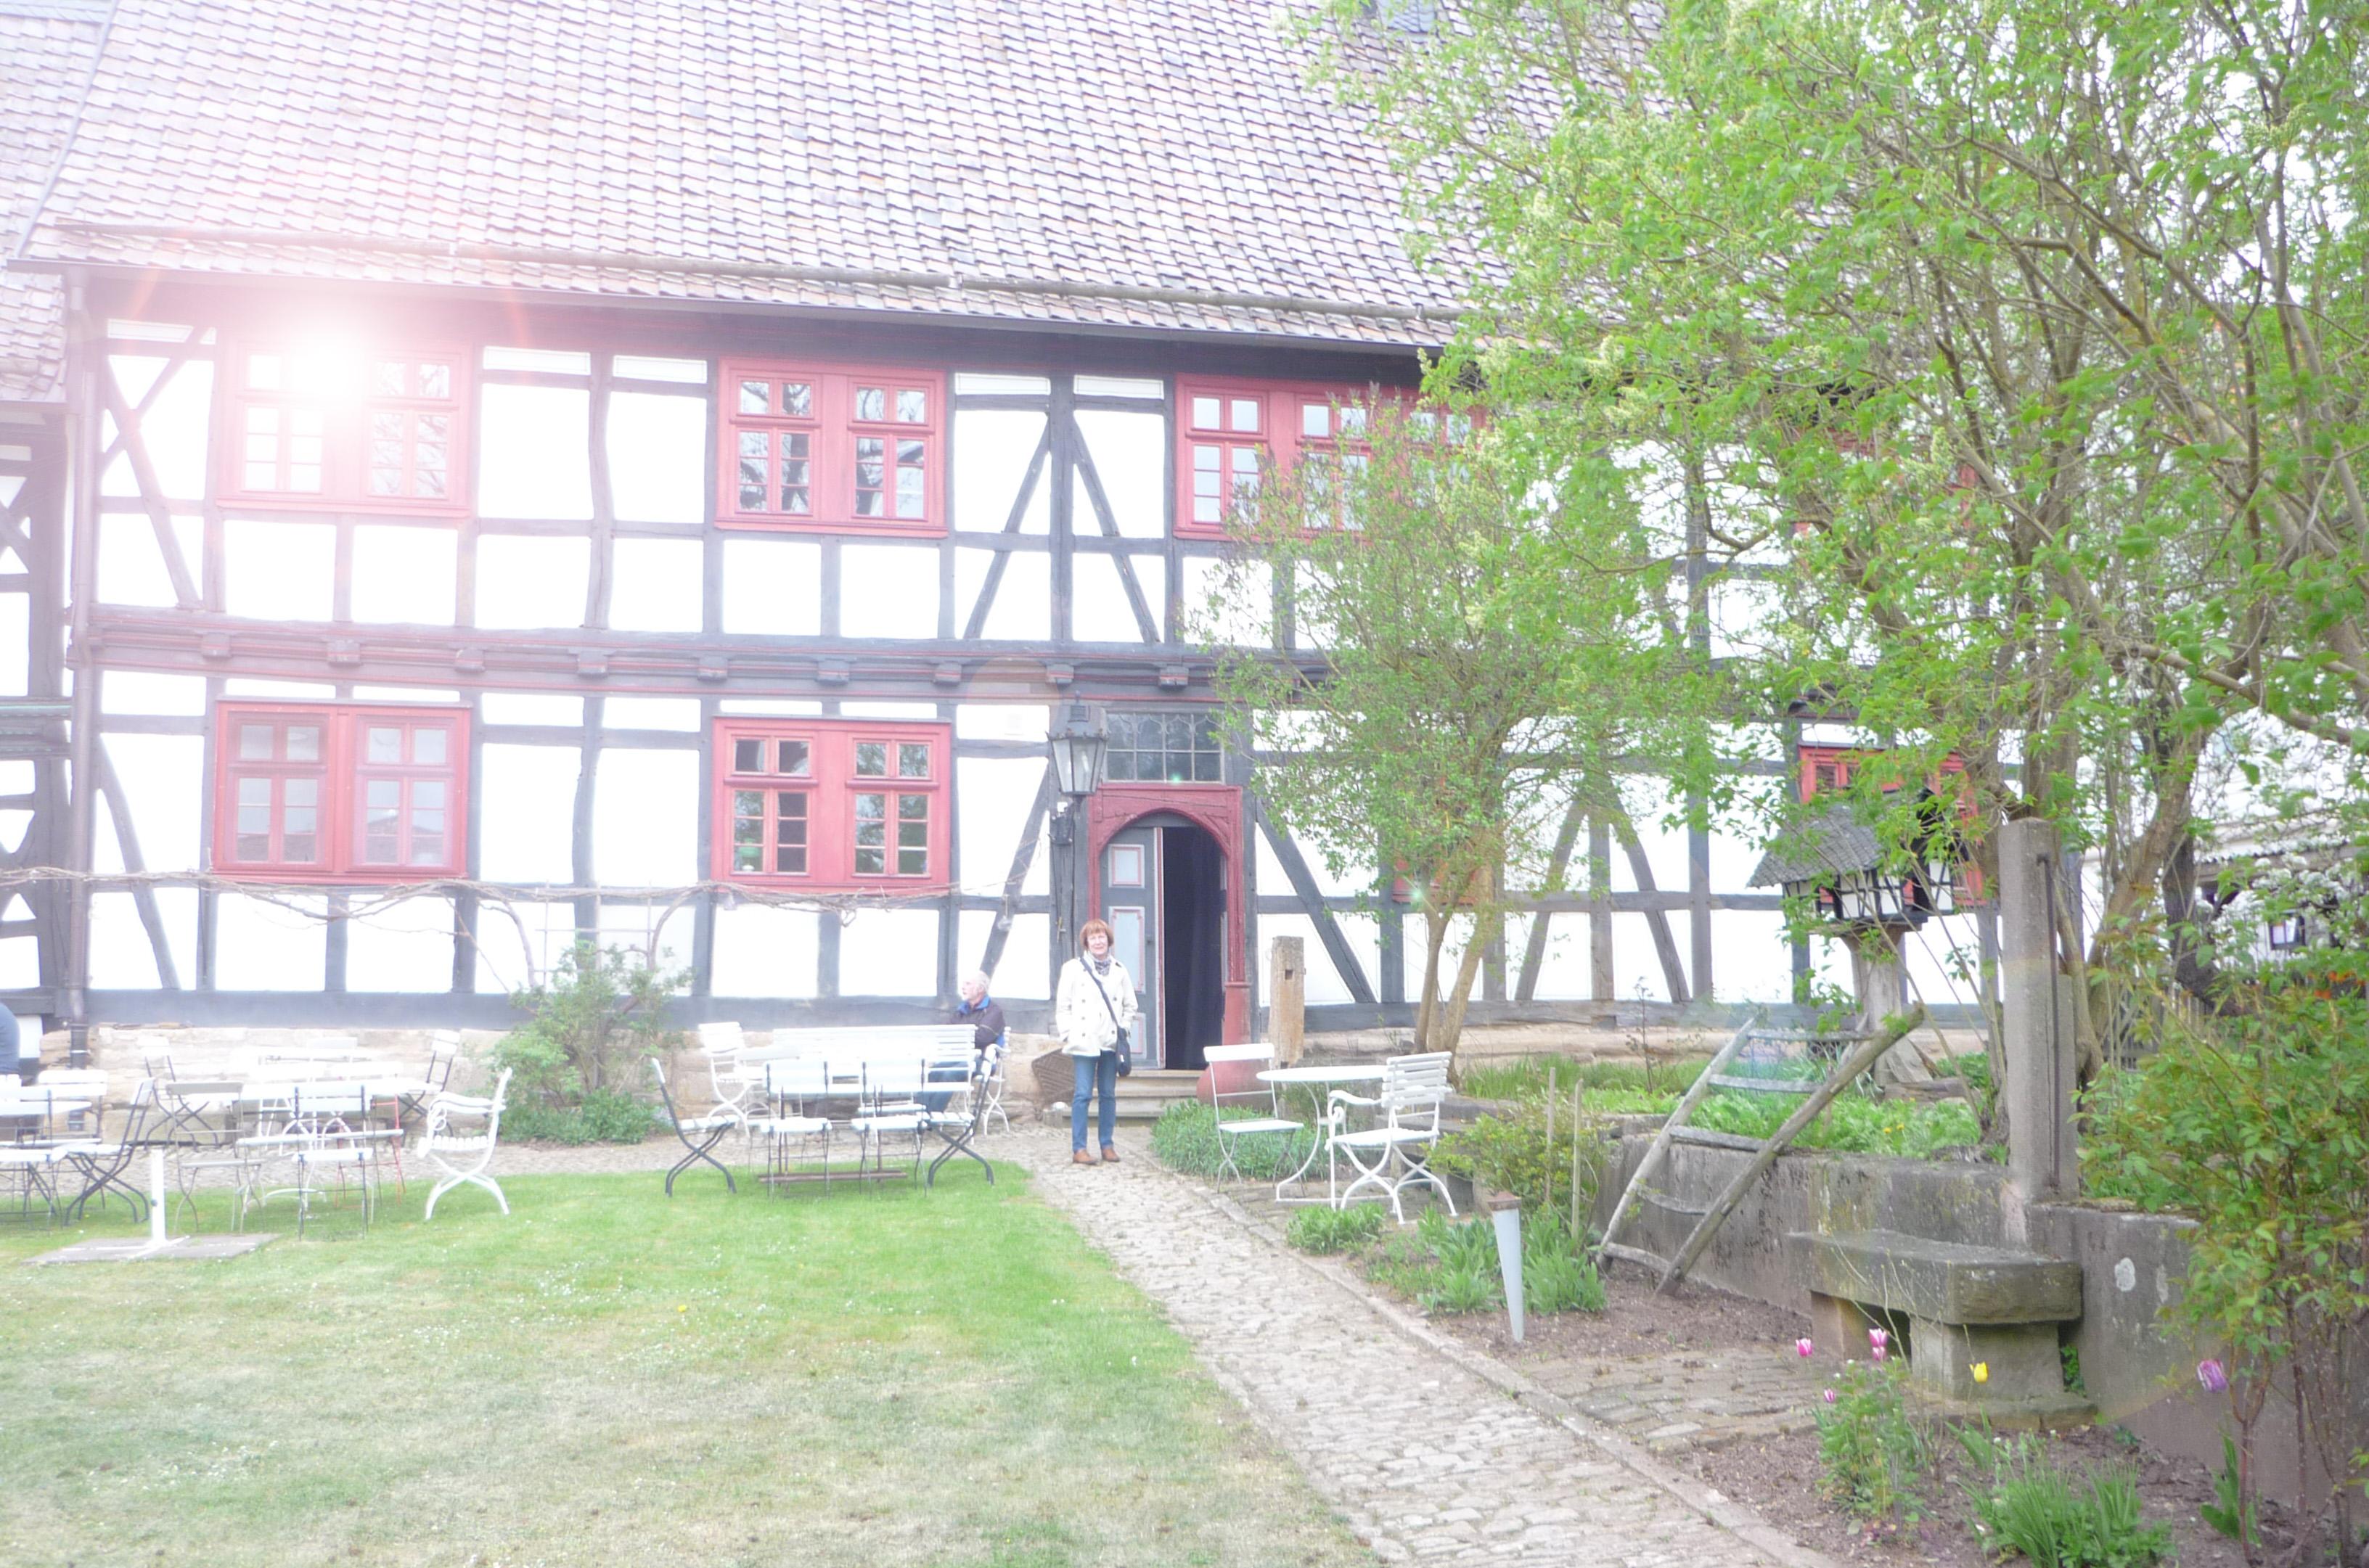 Garten des Kleegarten